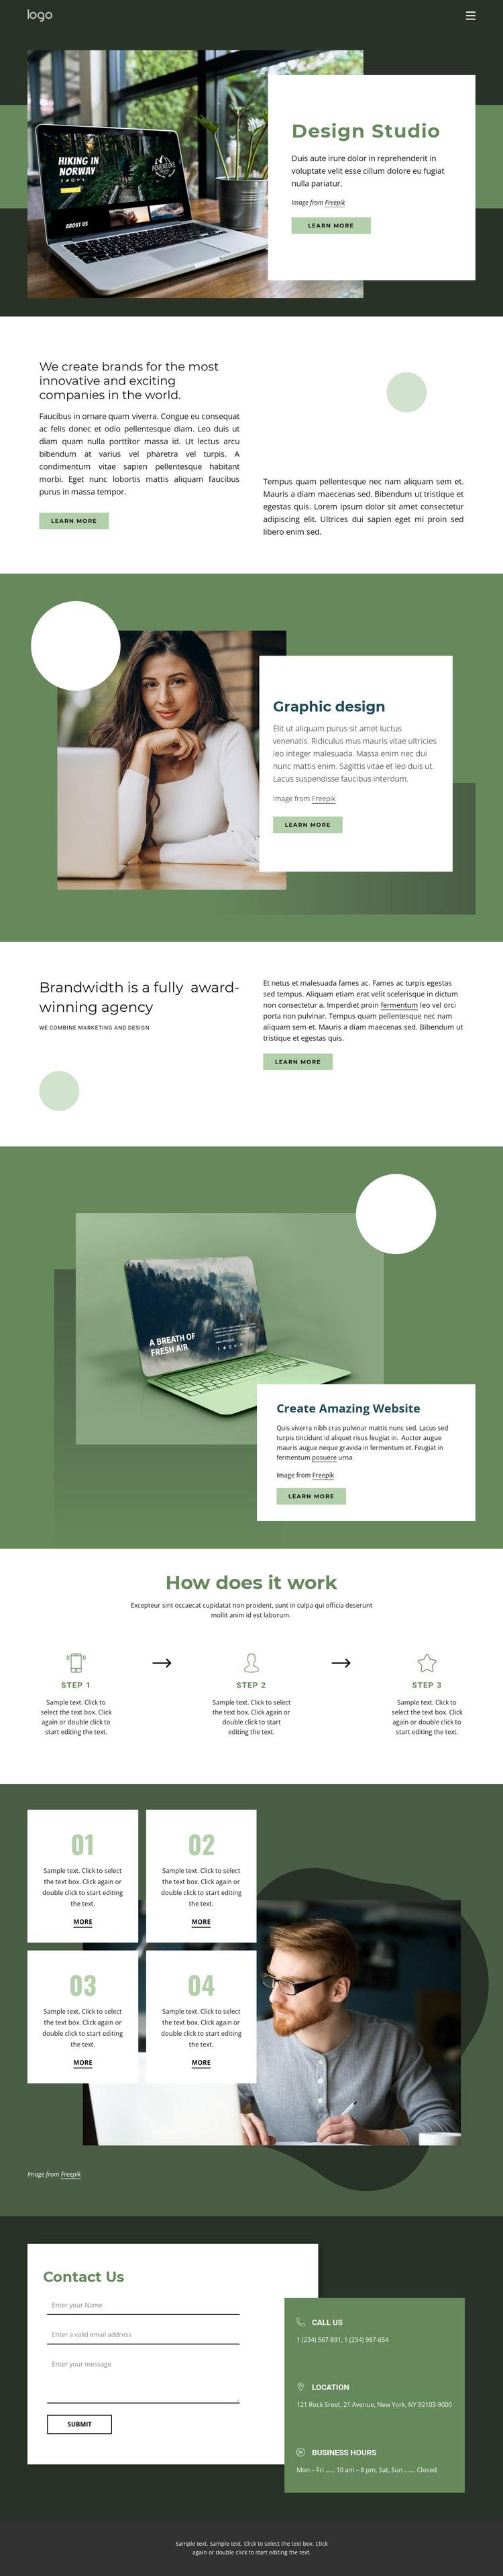 Design inspiration from nature WordPress Theme